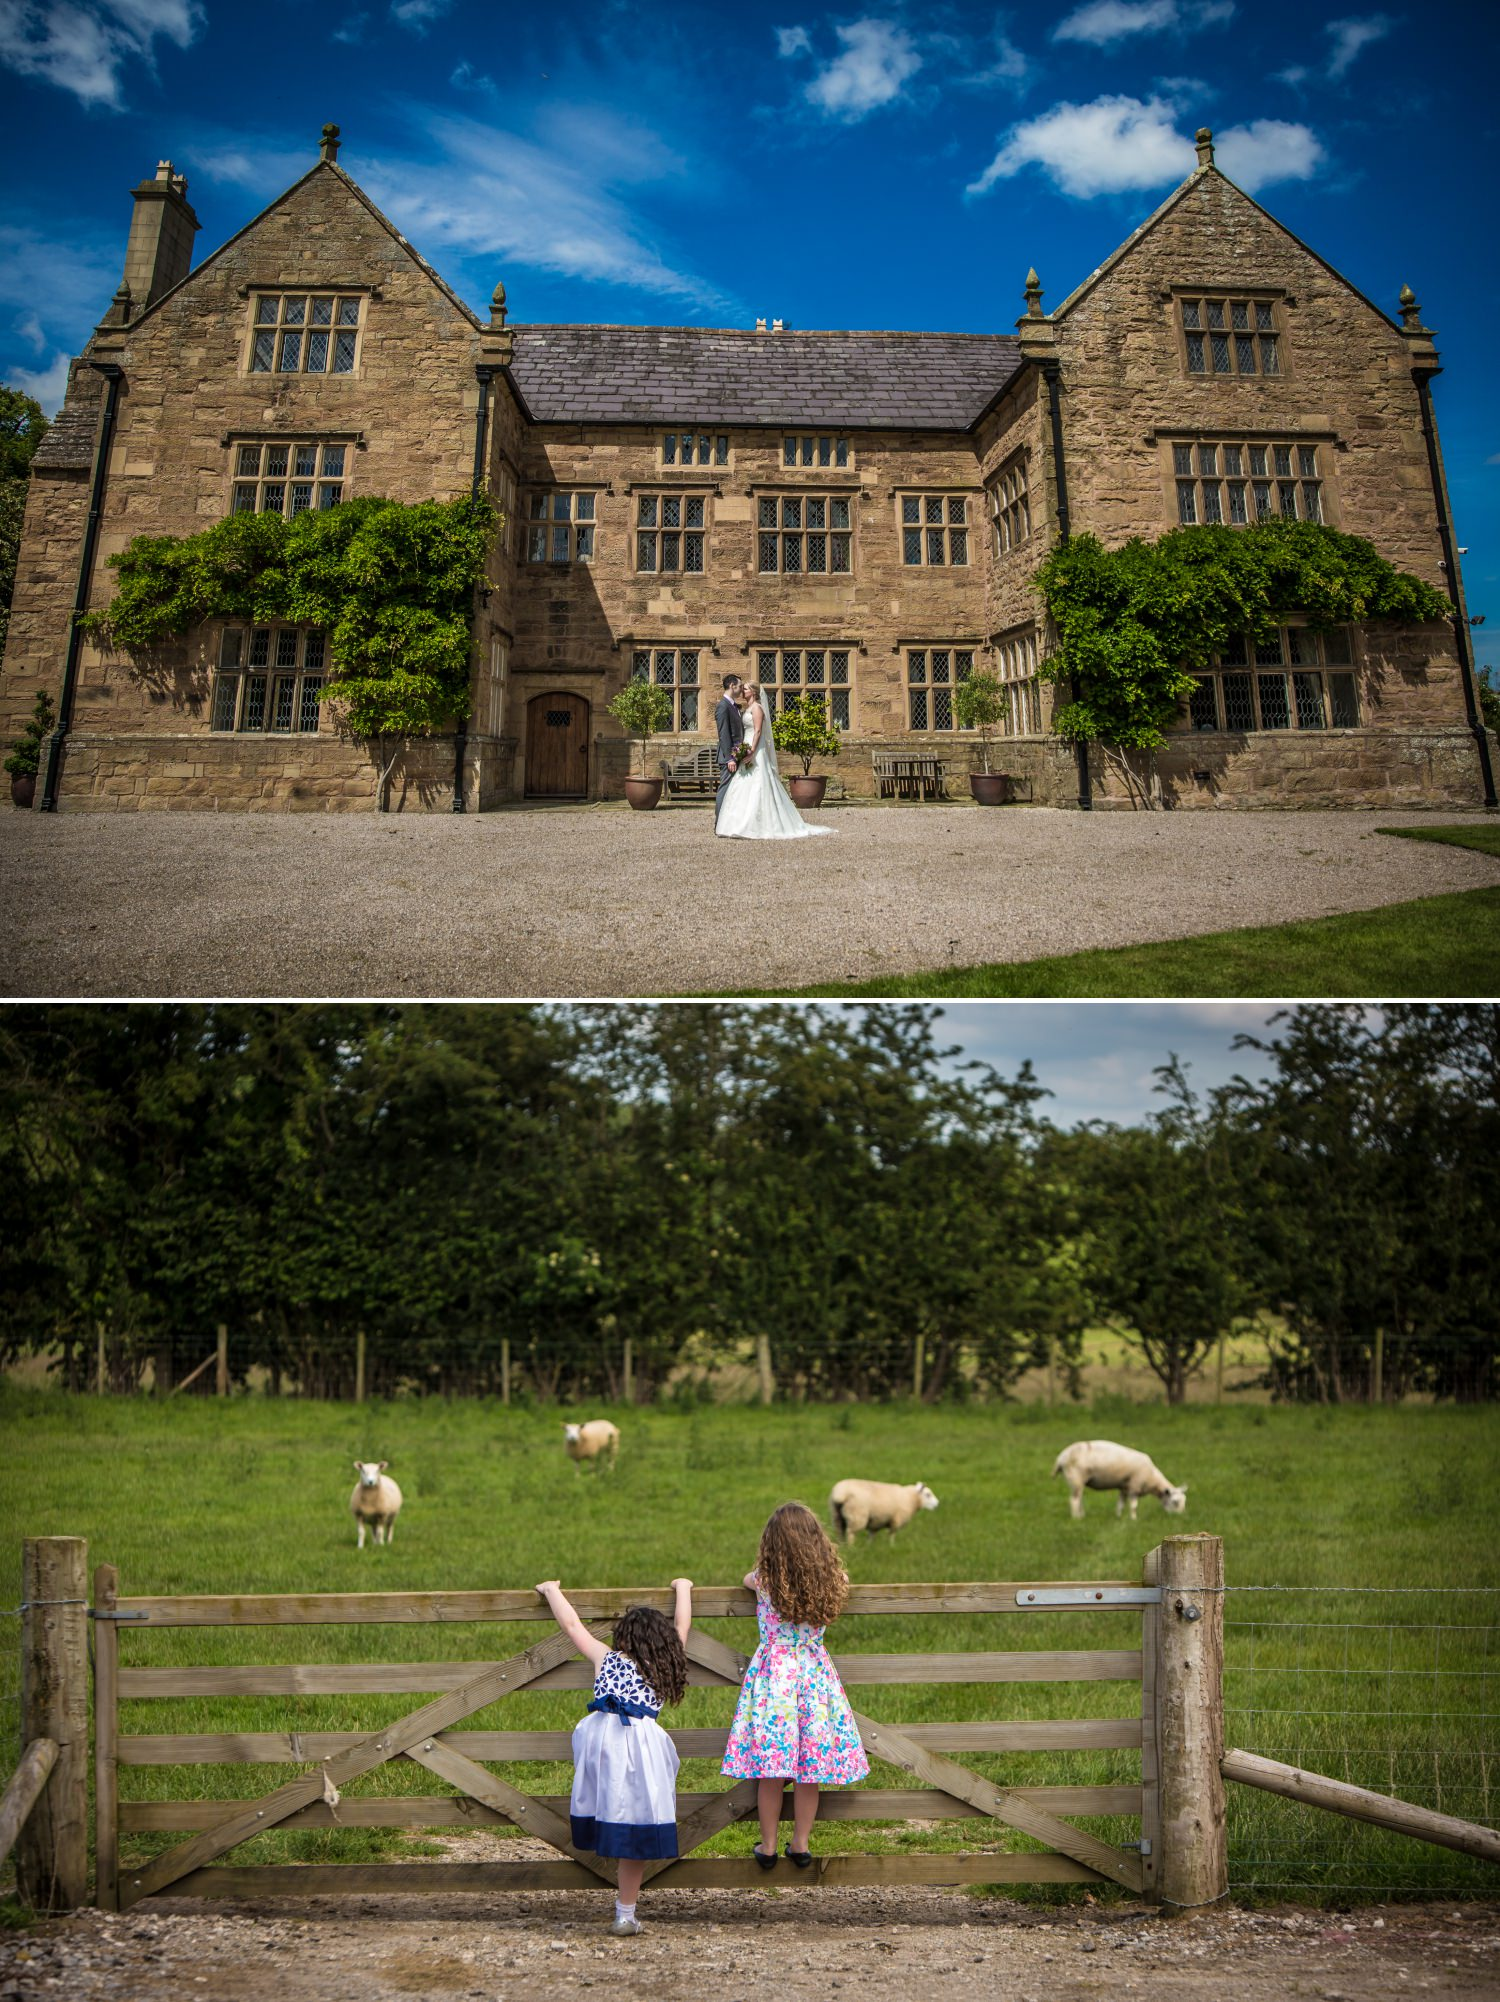 Wedding photographer at Pentrehobyn Hall